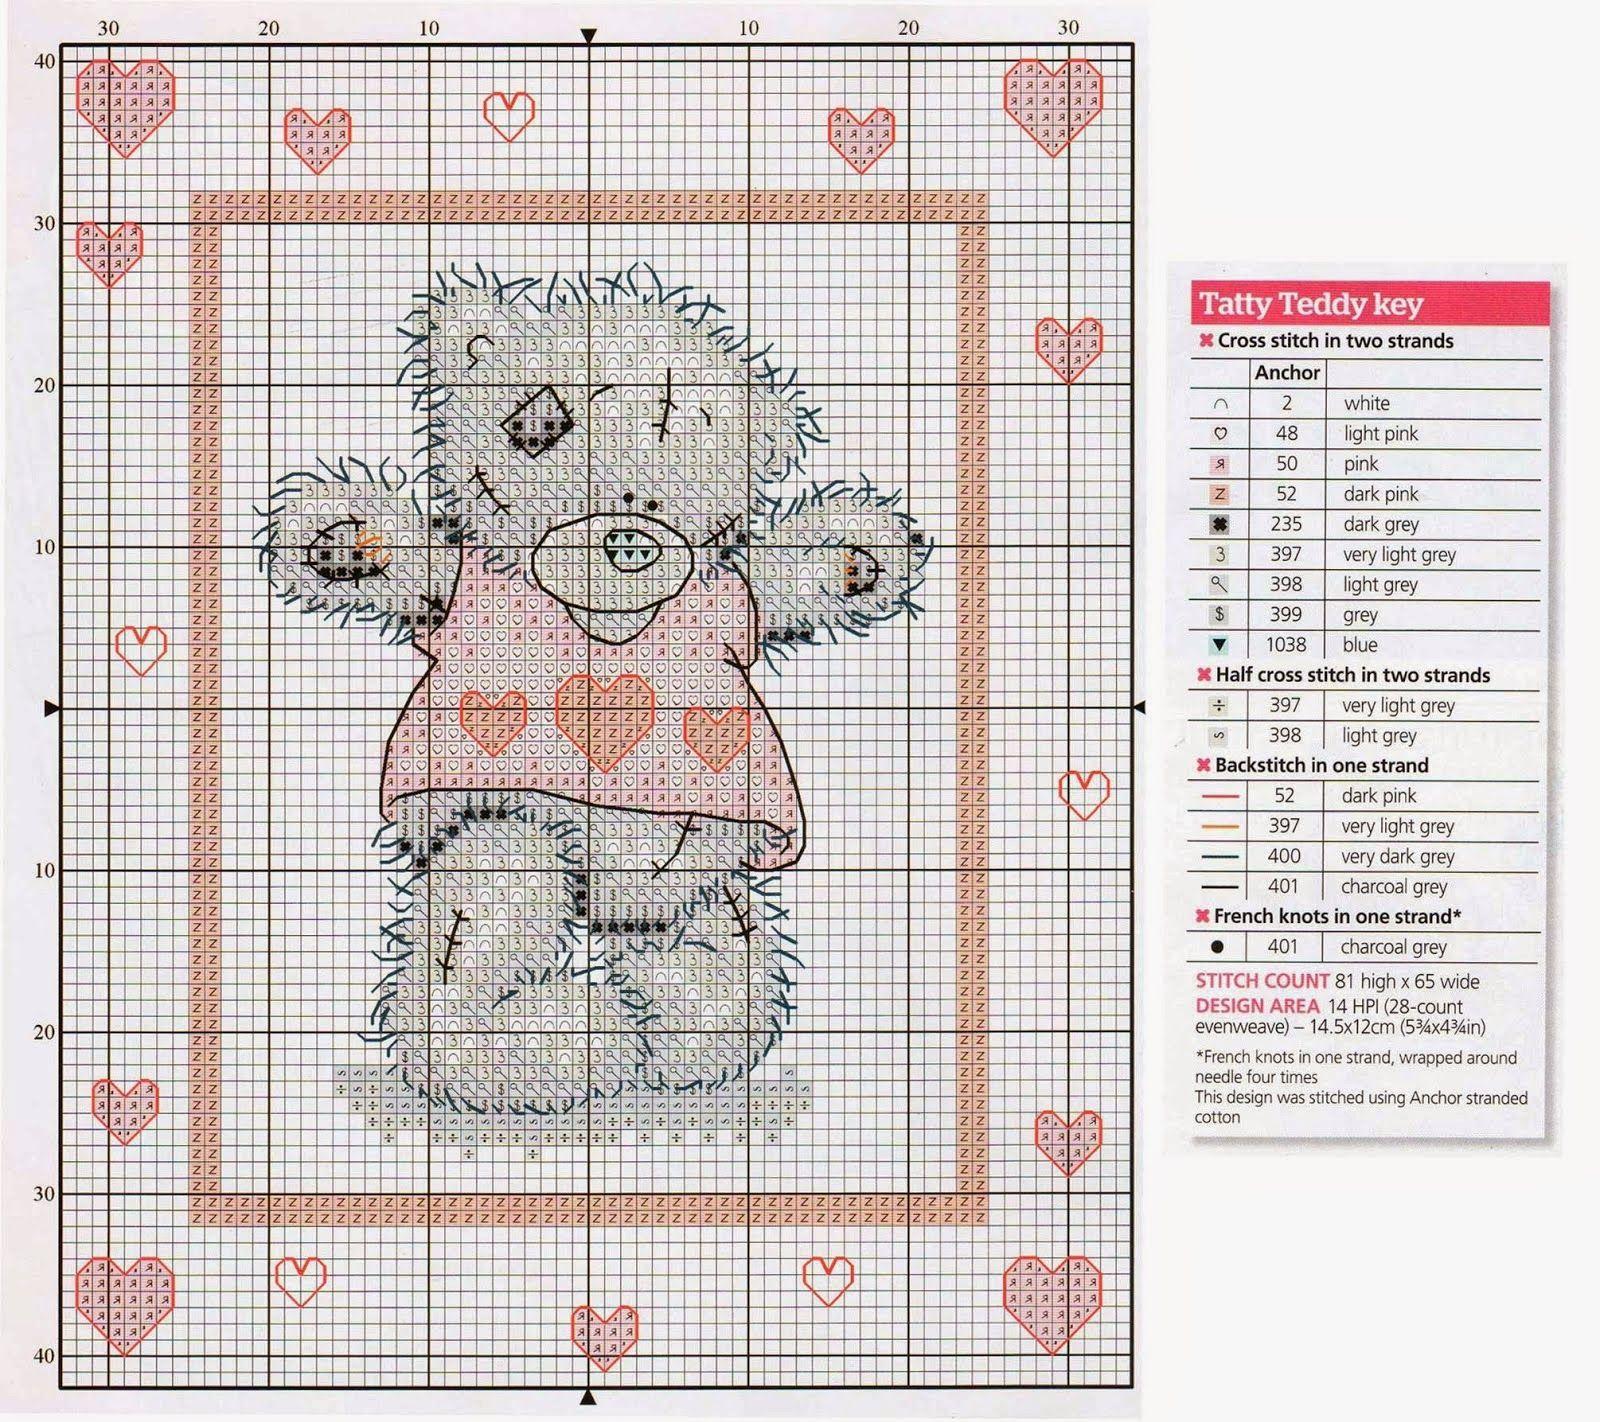 tatty-teddy-World-of-cross-stitching--152-010-graf.jpg (1600×1422)